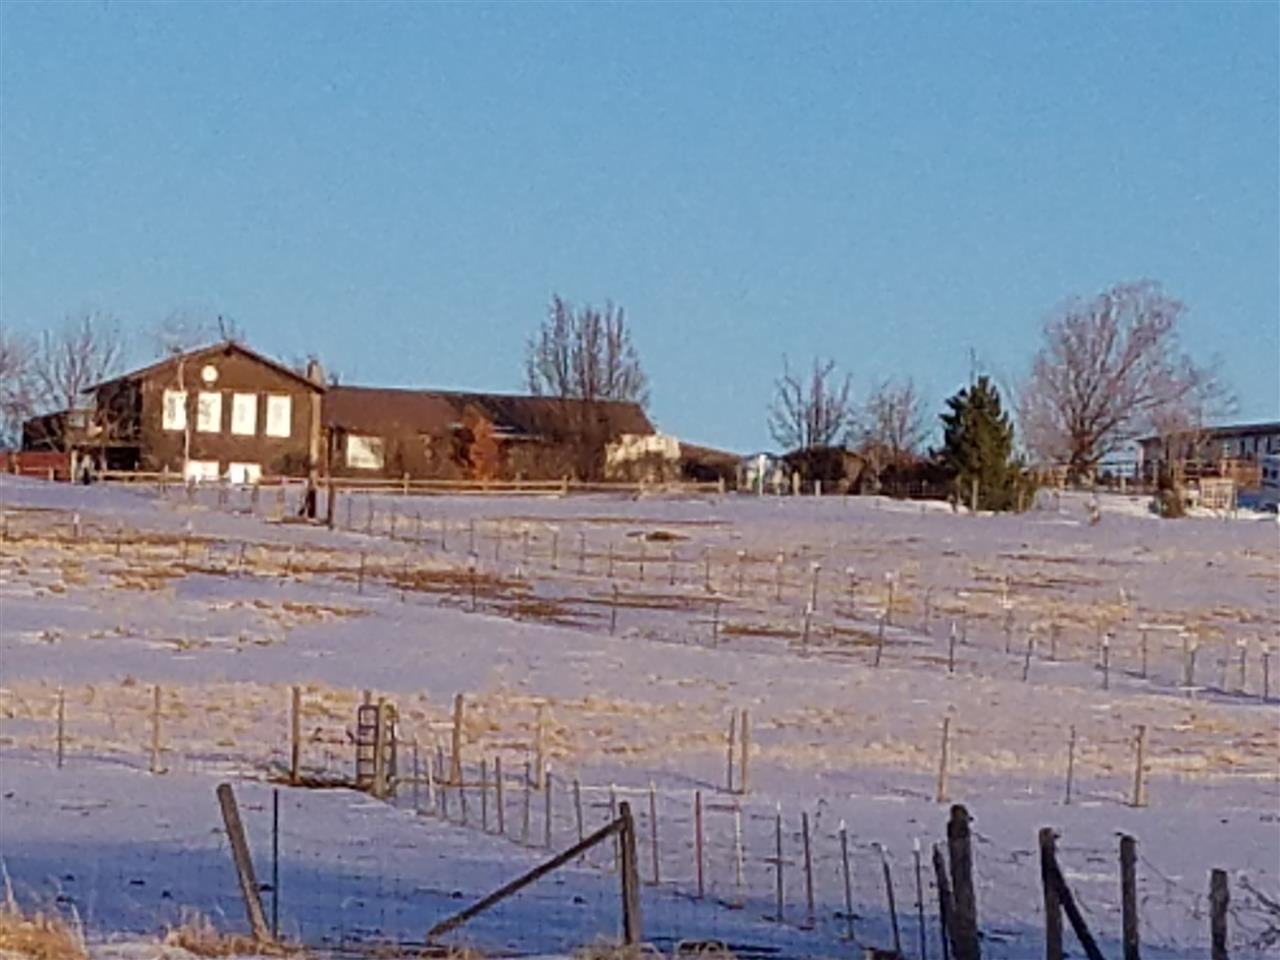 Single Family Home for Sale at 28 Red Barn Lane 28 Red Barn Lane Grangeville, Idaho 83530